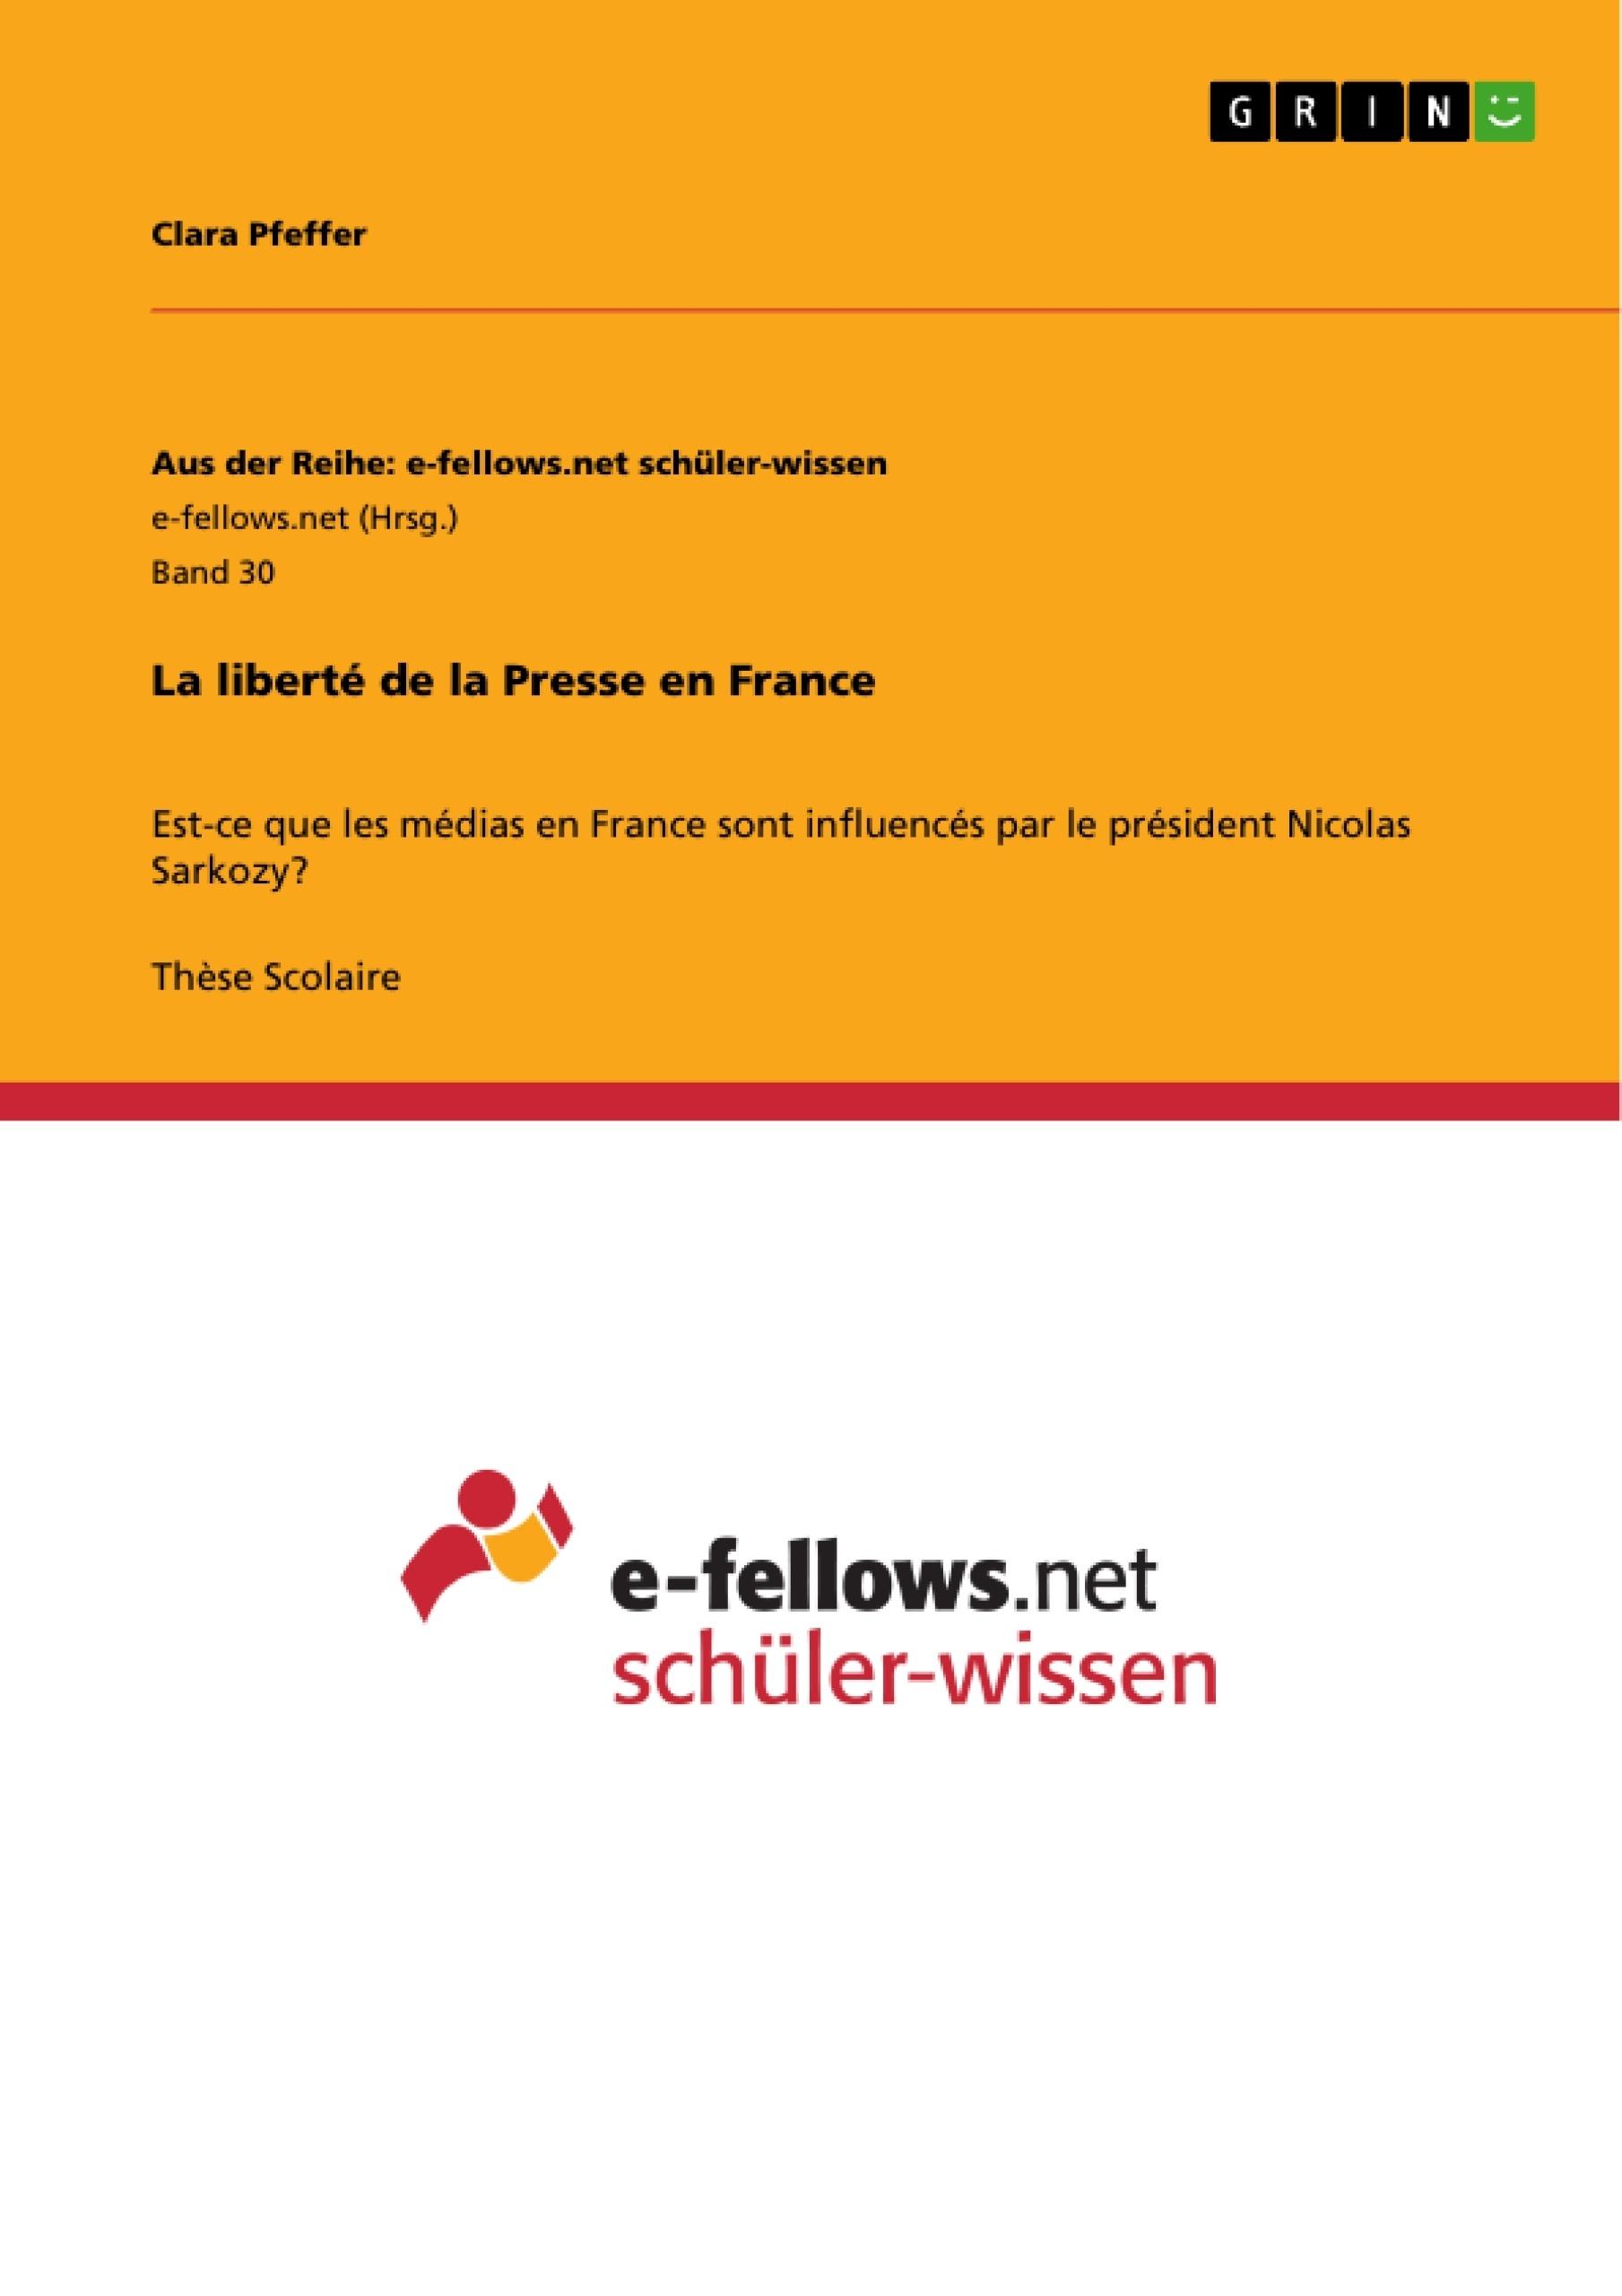 Titre: La liberté de la Presse en France